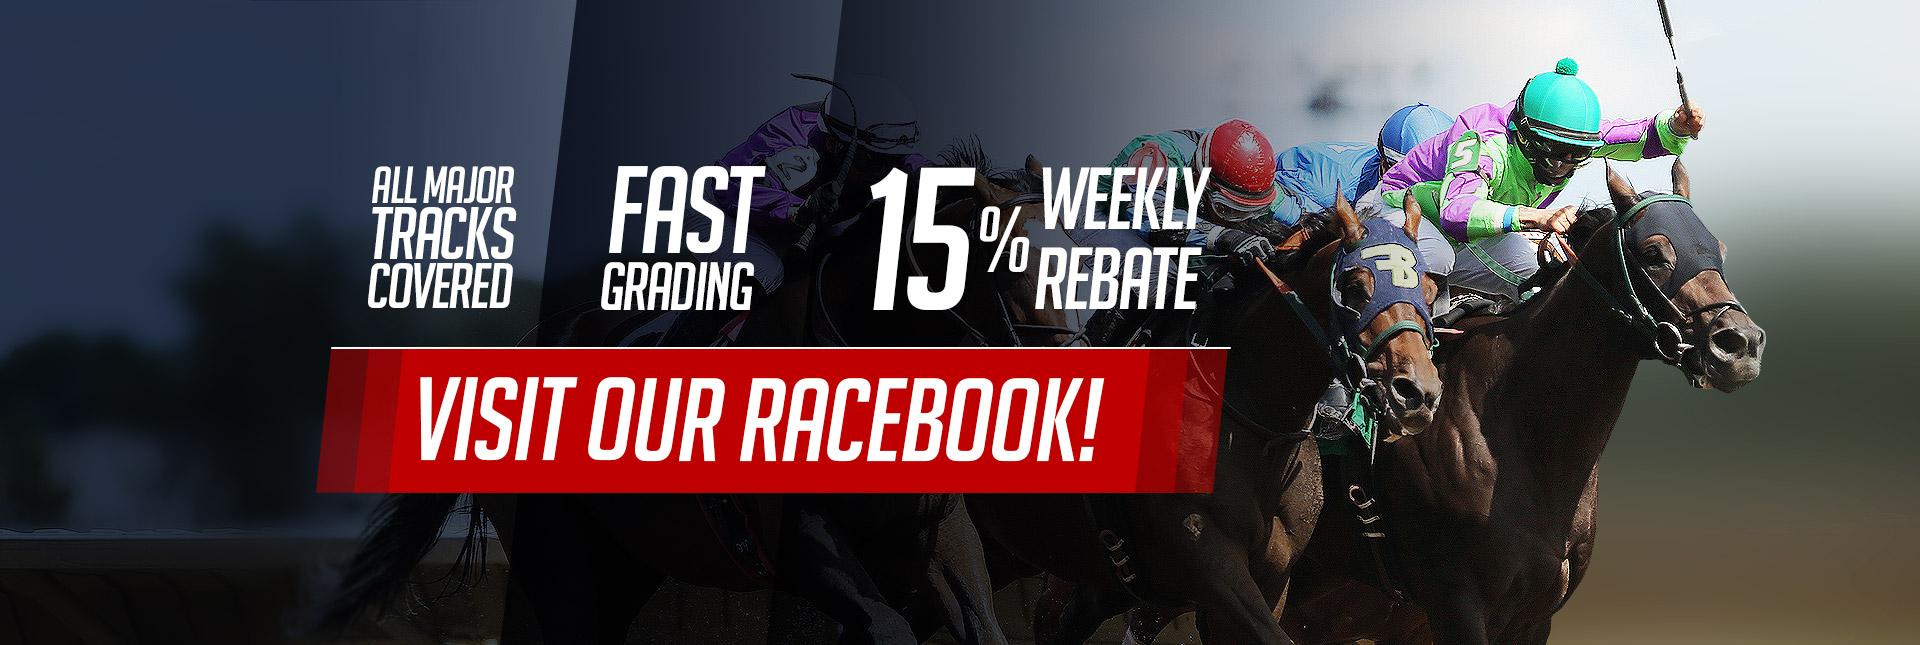 Visit our Racebook